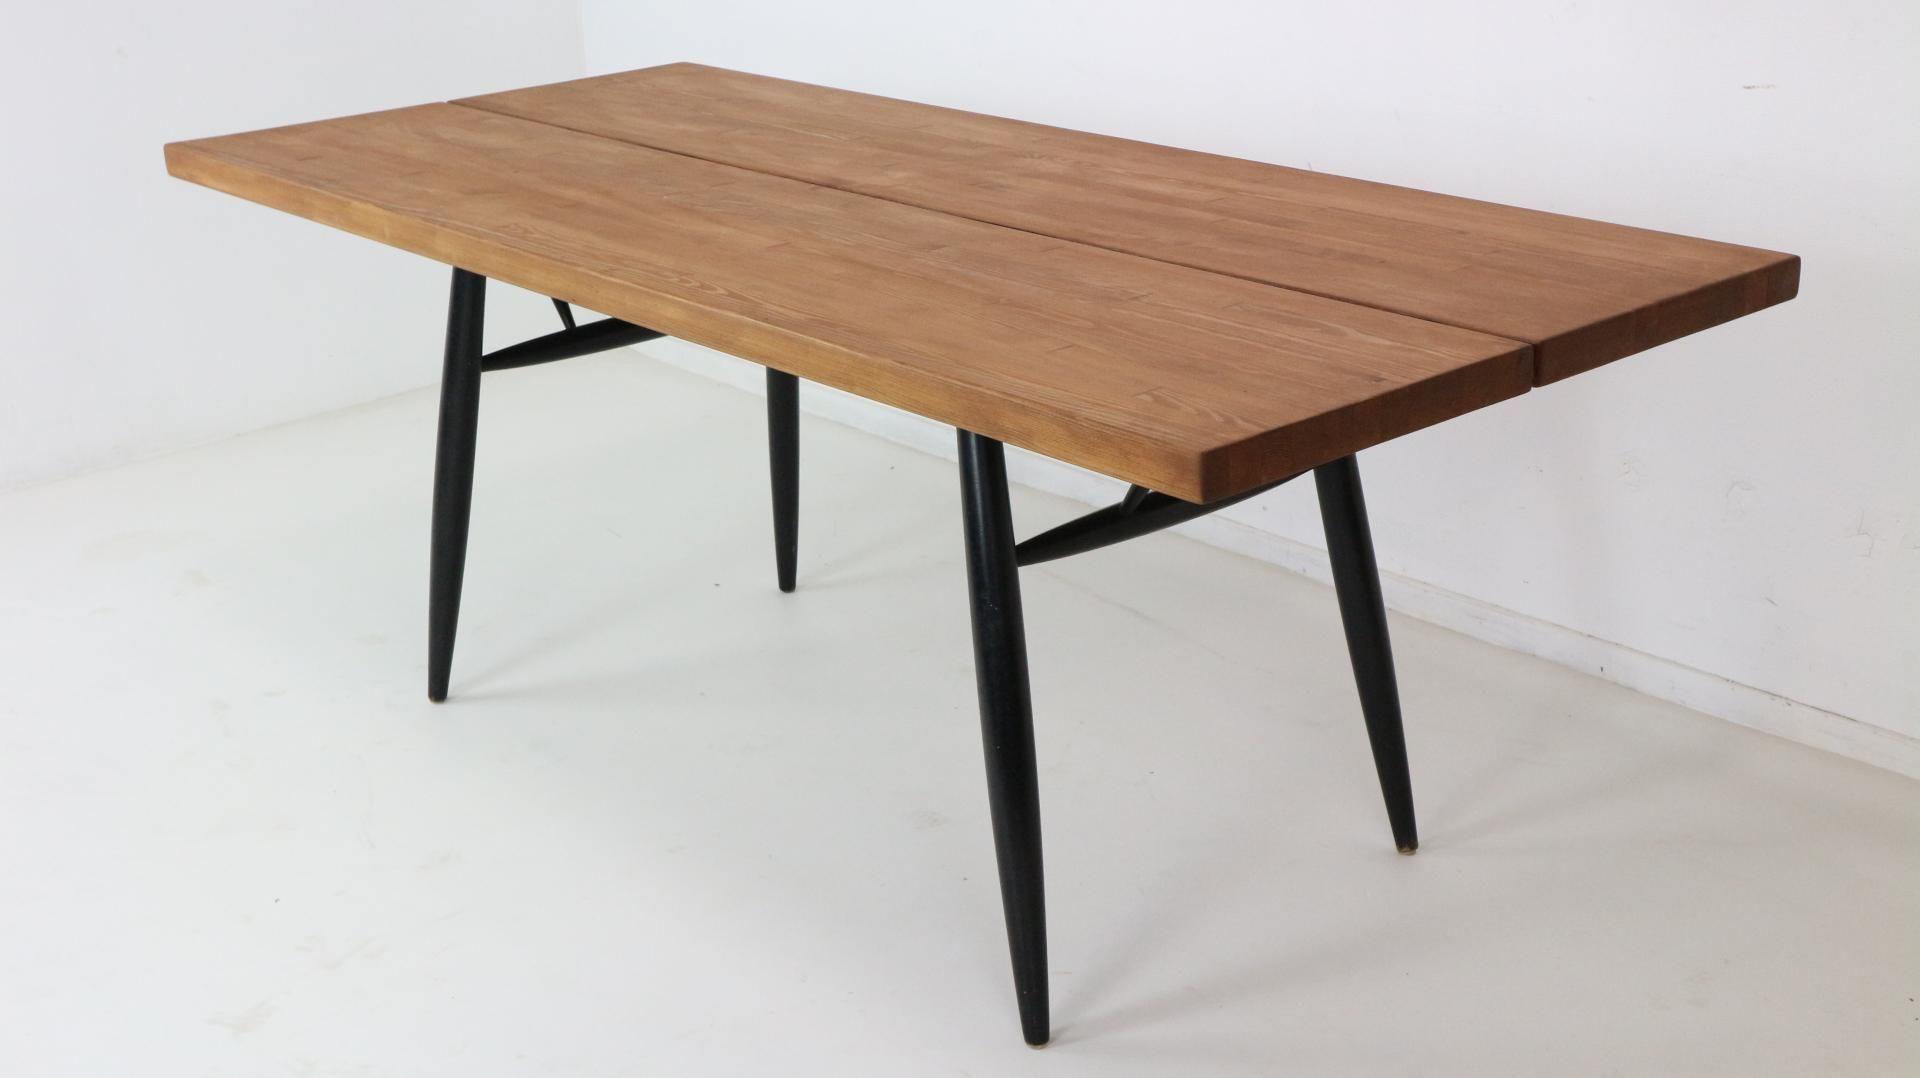 grande table de salle manger pirkka par ilmari tapiovaara pour laukaan puu 1950s 2 - Grande Table Salle A Manger 2